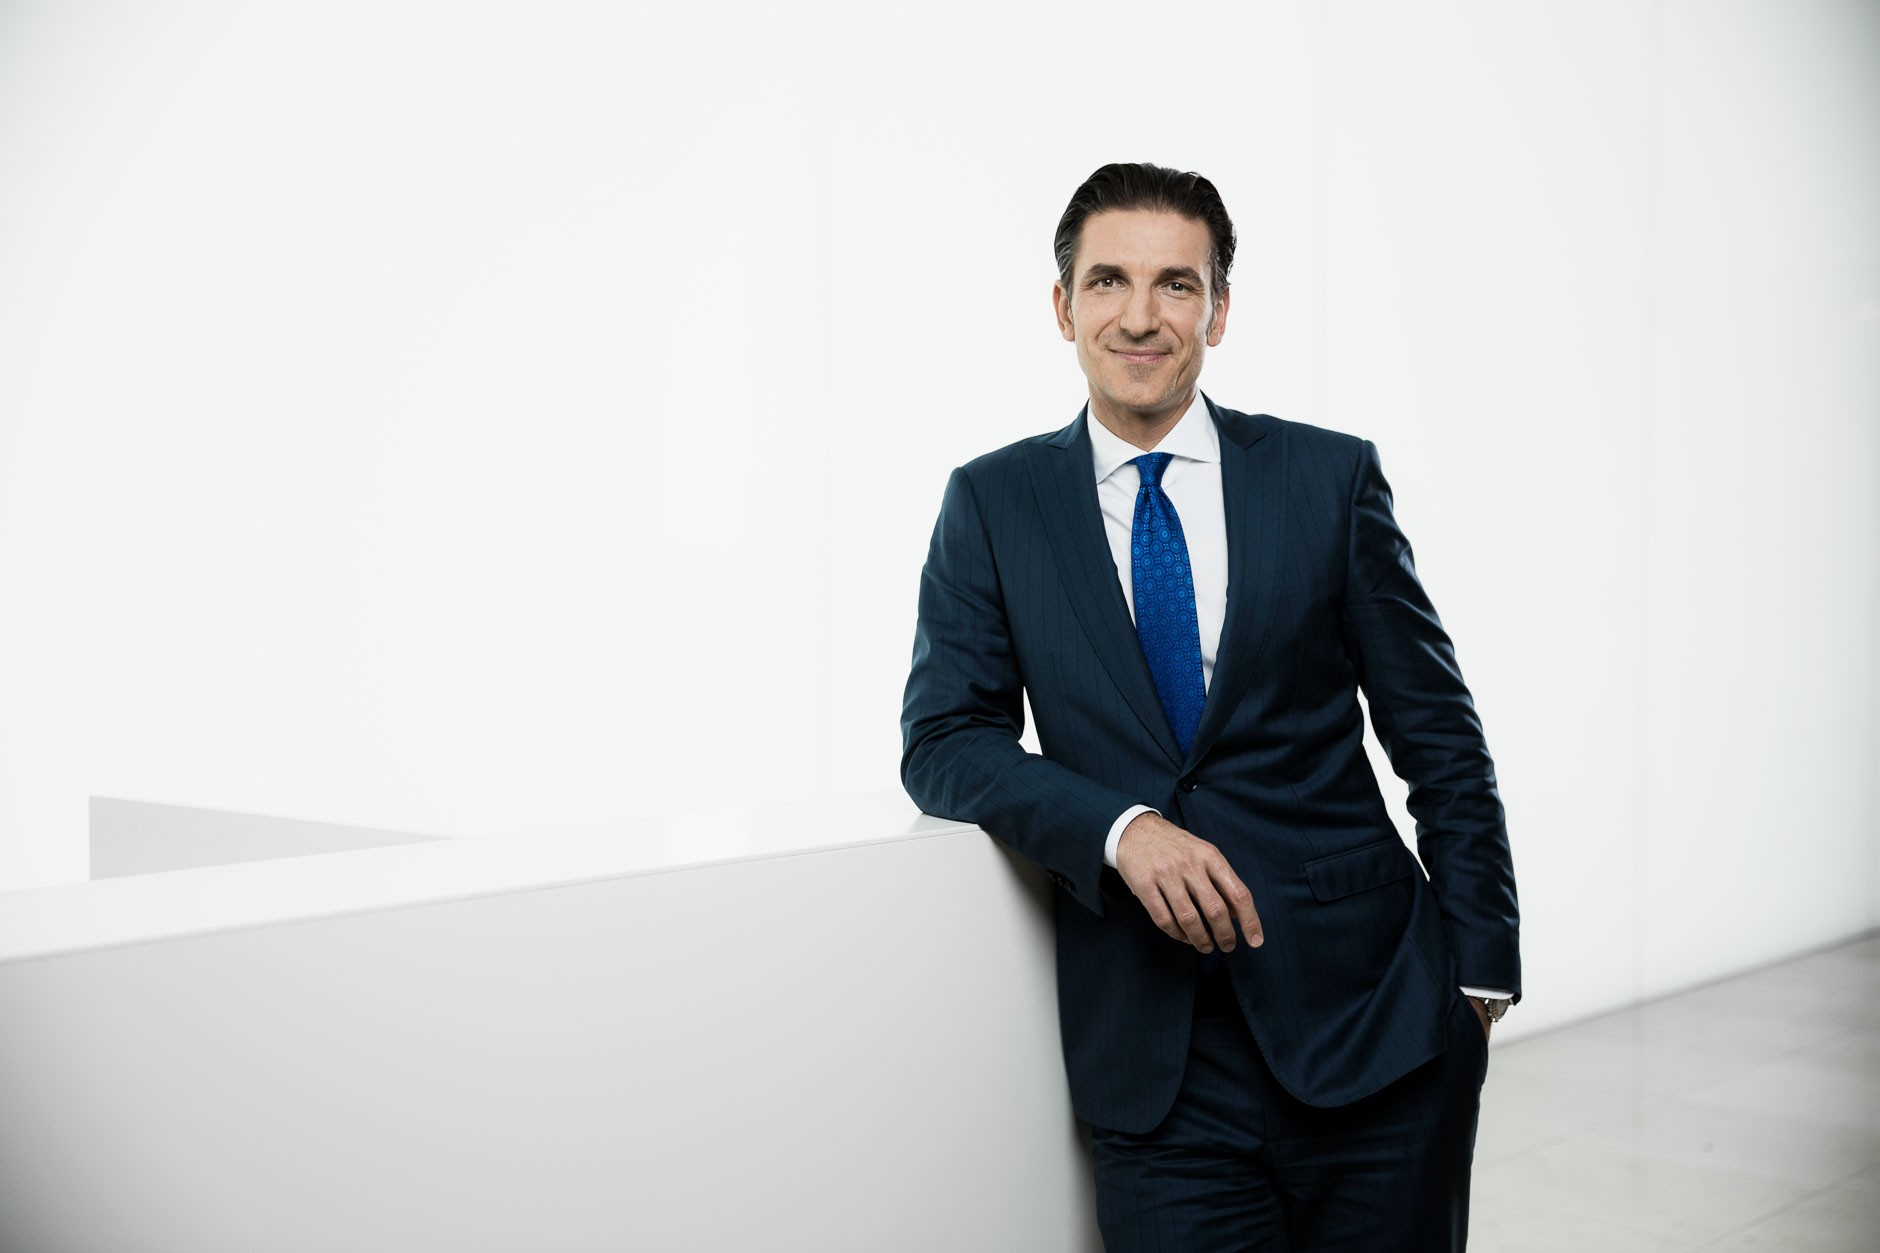 Businessporträt Goran Baric, Geschäftsführer Page Group, Frankfurt am Main